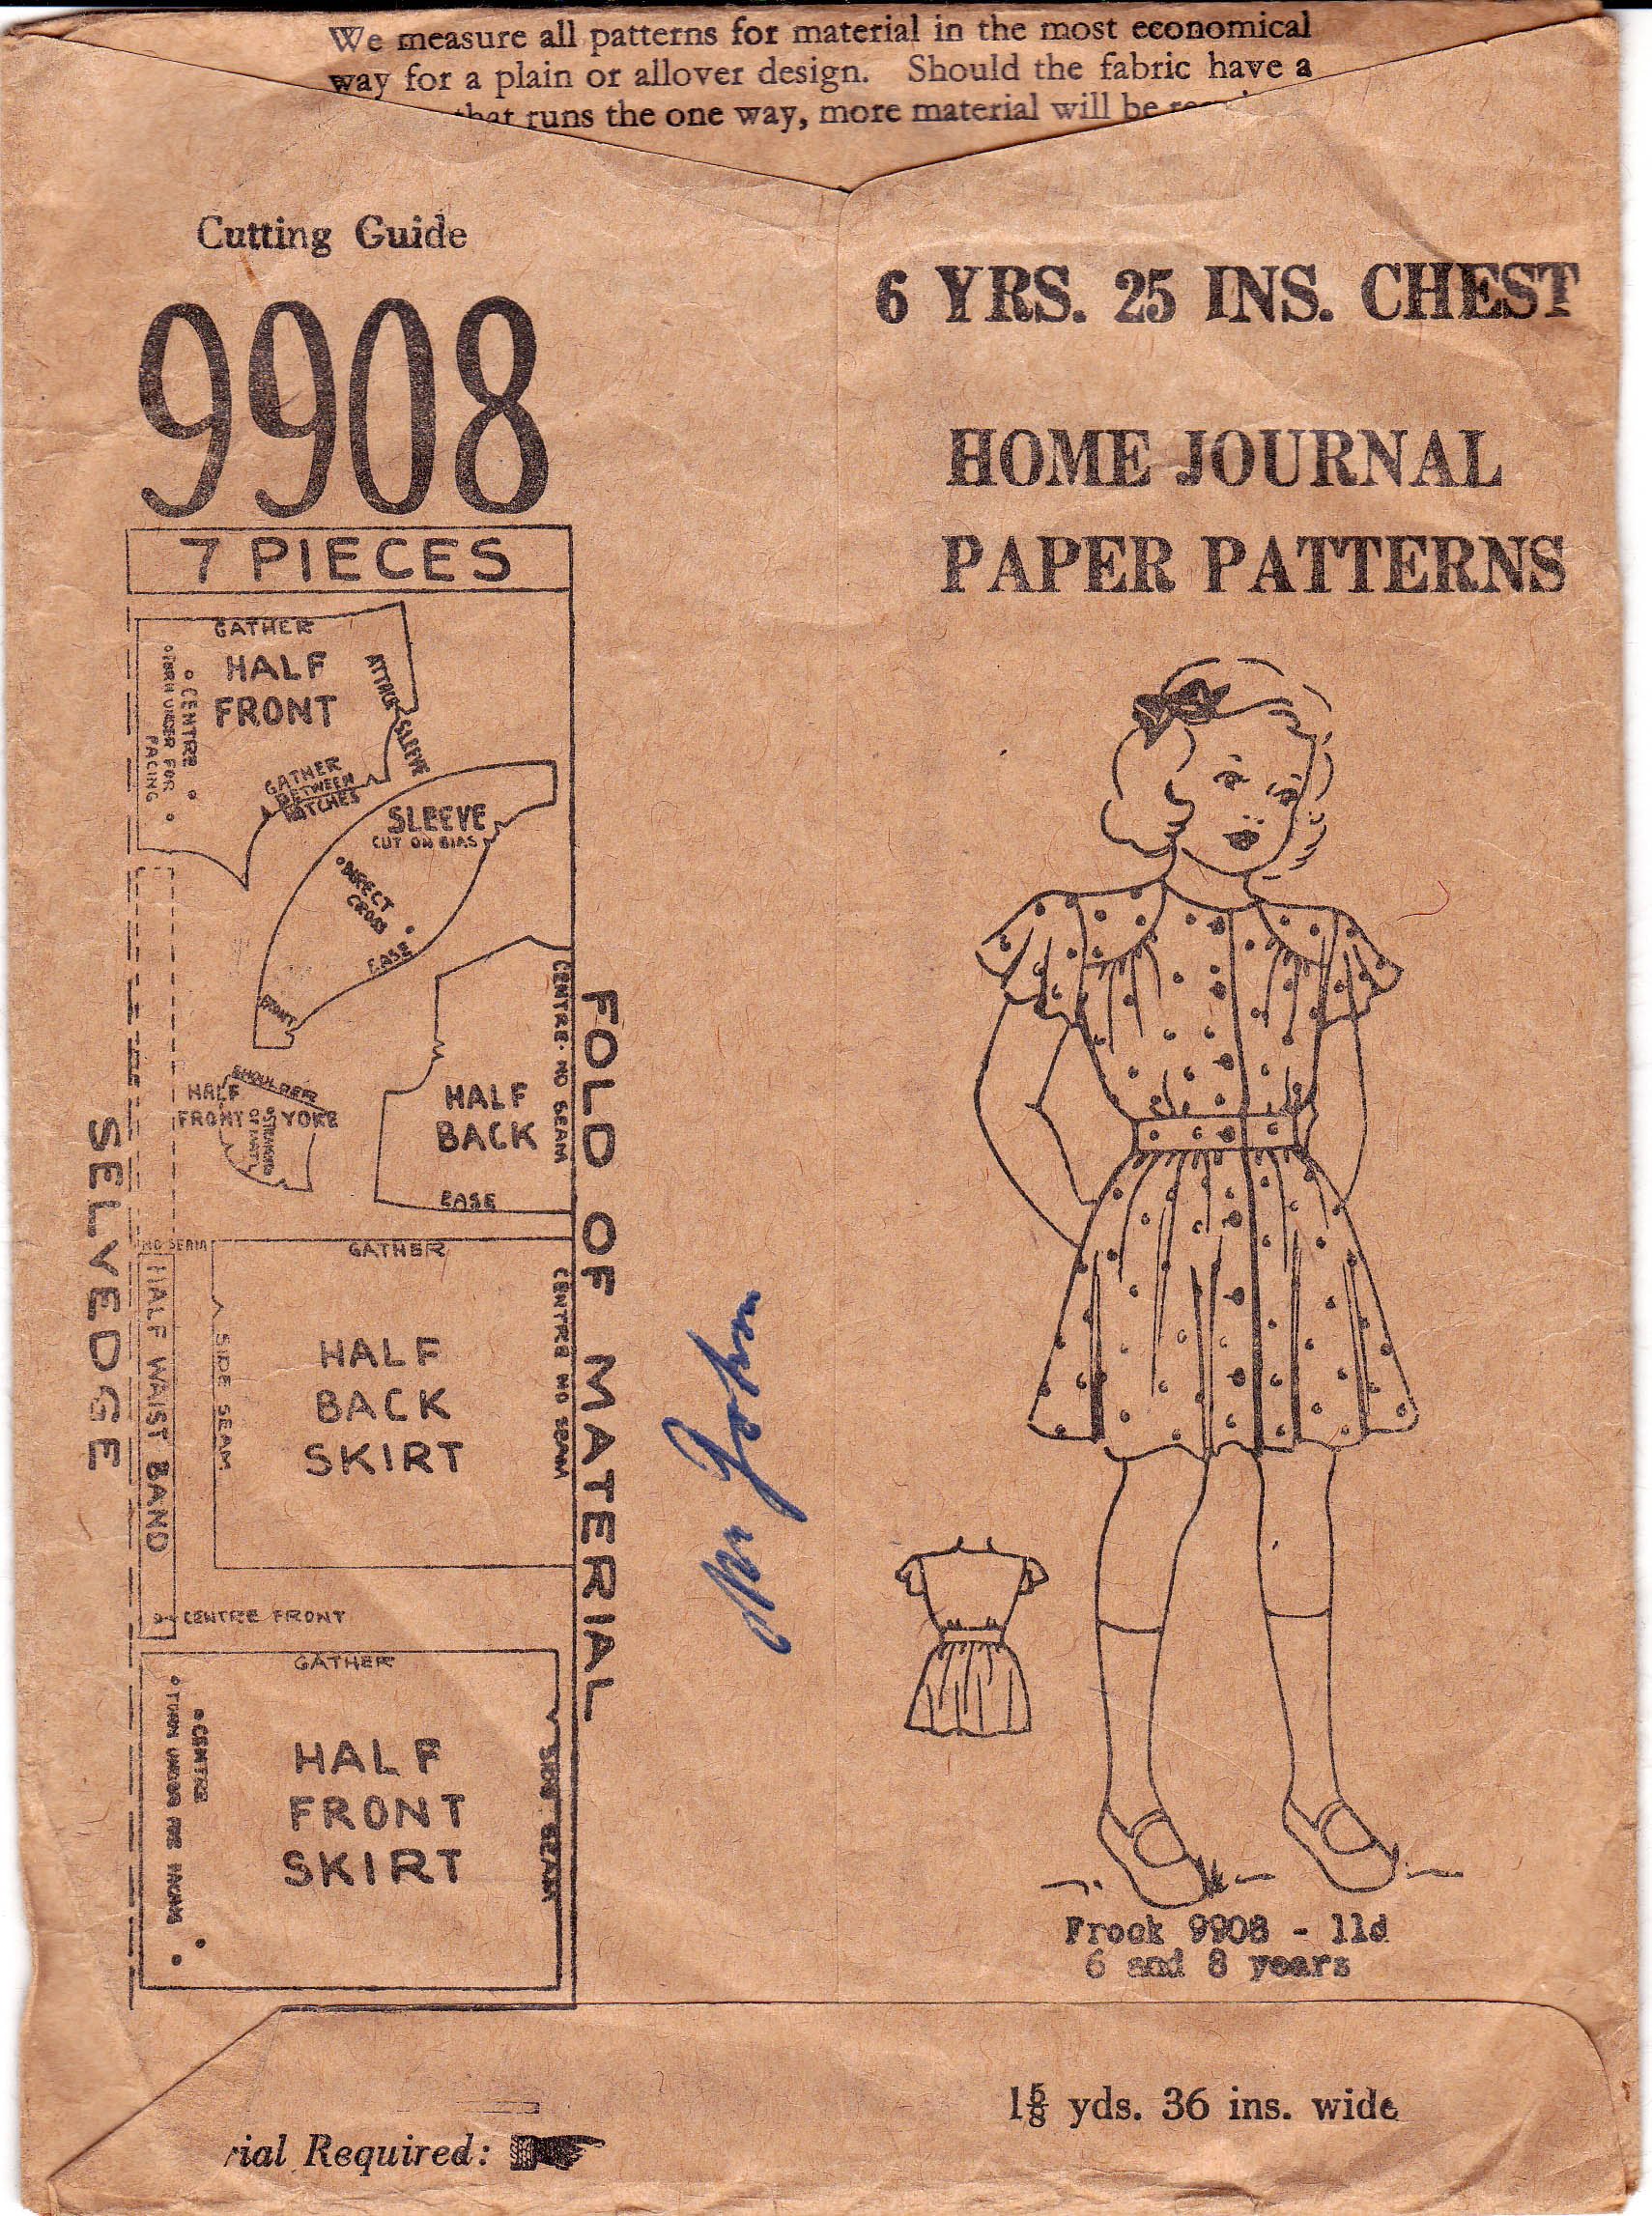 Australian Home Journal 9908